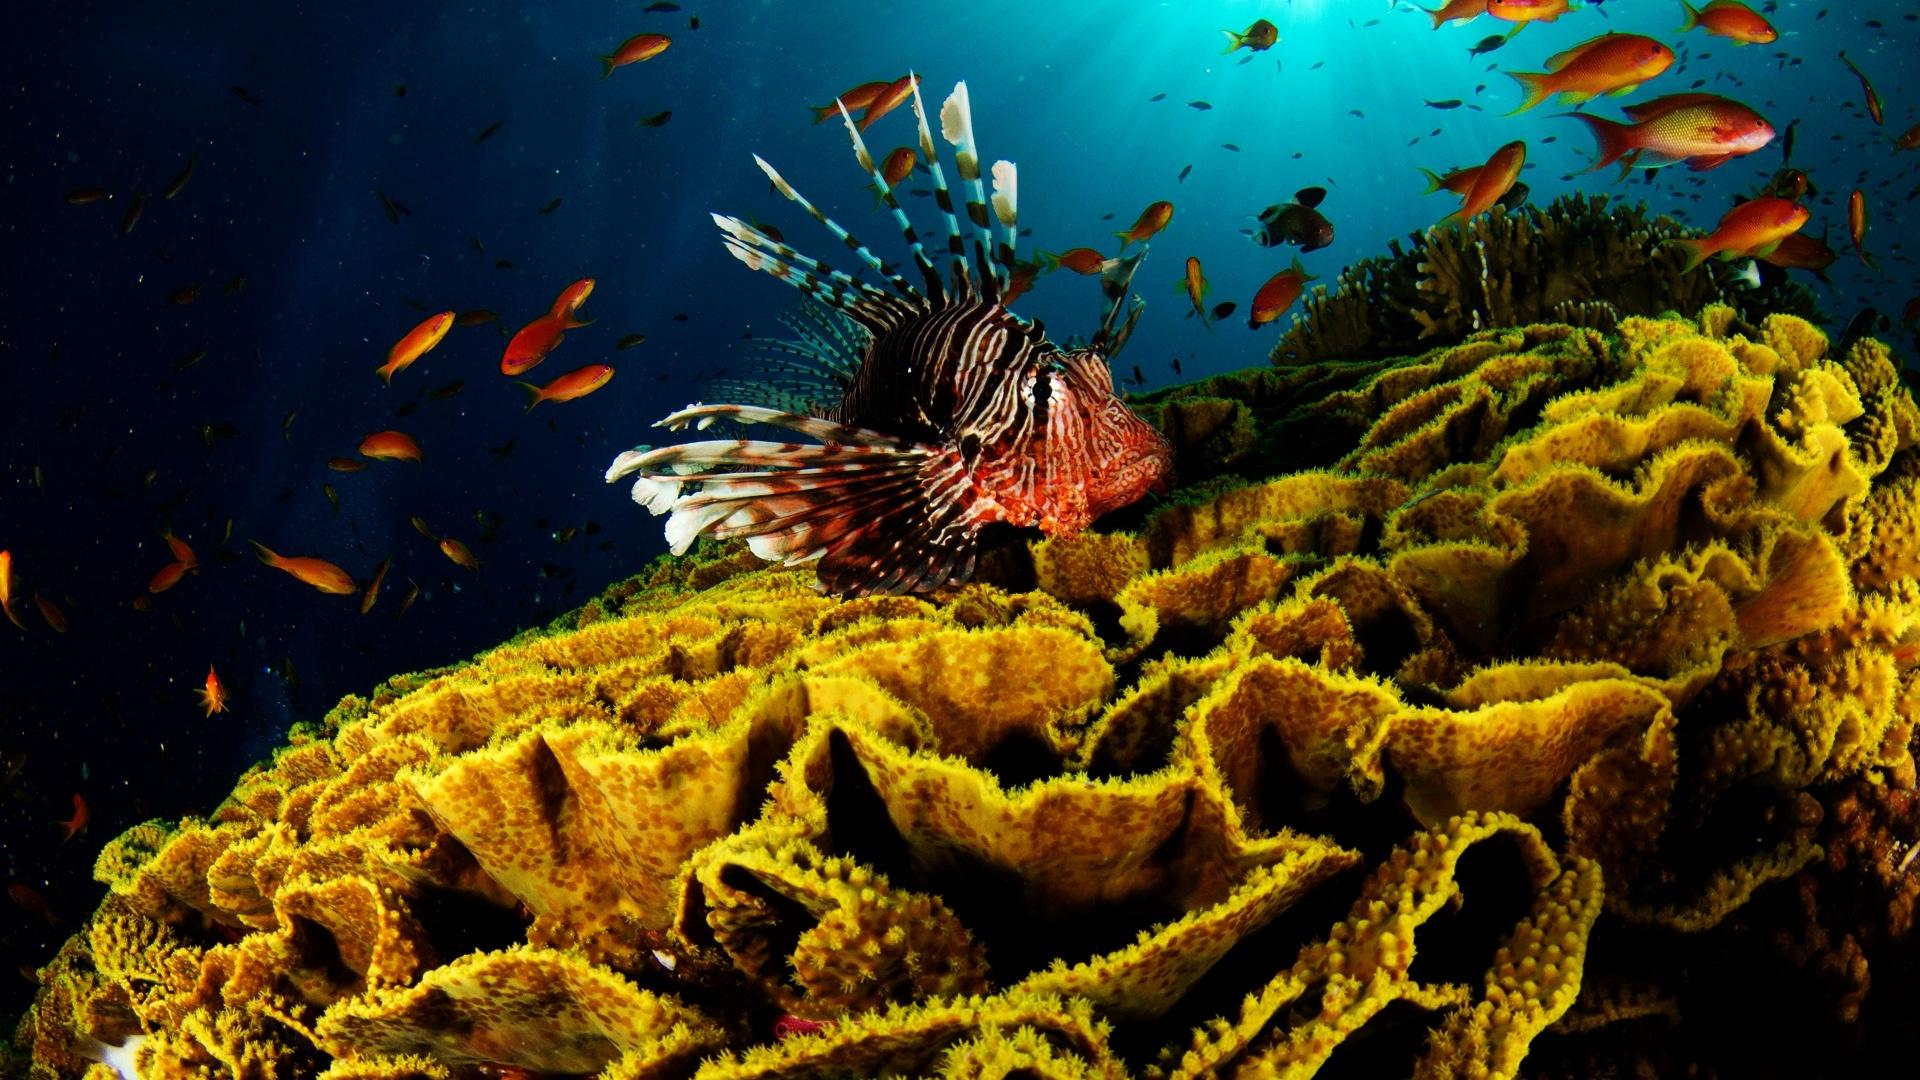 Fall Wallpaper Hd For Galaxy S4 Hd Underwater World Hd Wallpaper Download